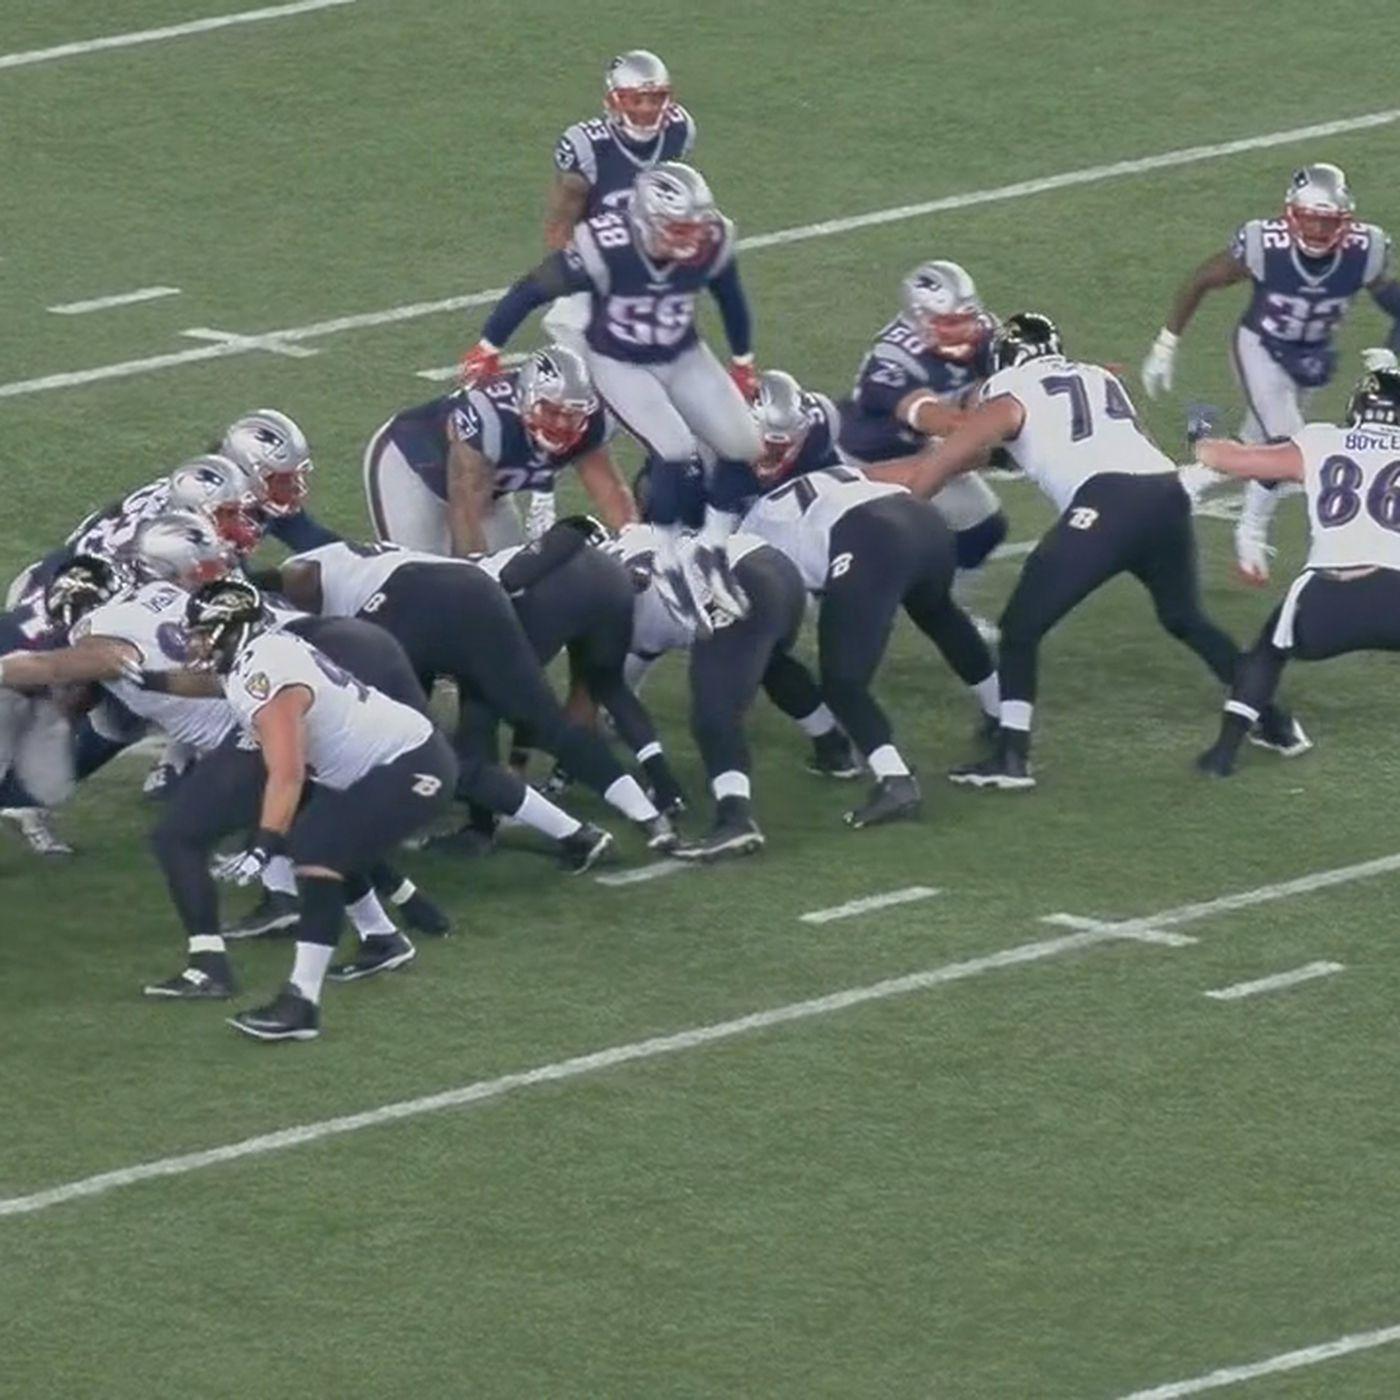 126dbd485187 Shea McClellin leaps over everybody to block a field goal in Ravens vs.  Patriots - SBNation.com